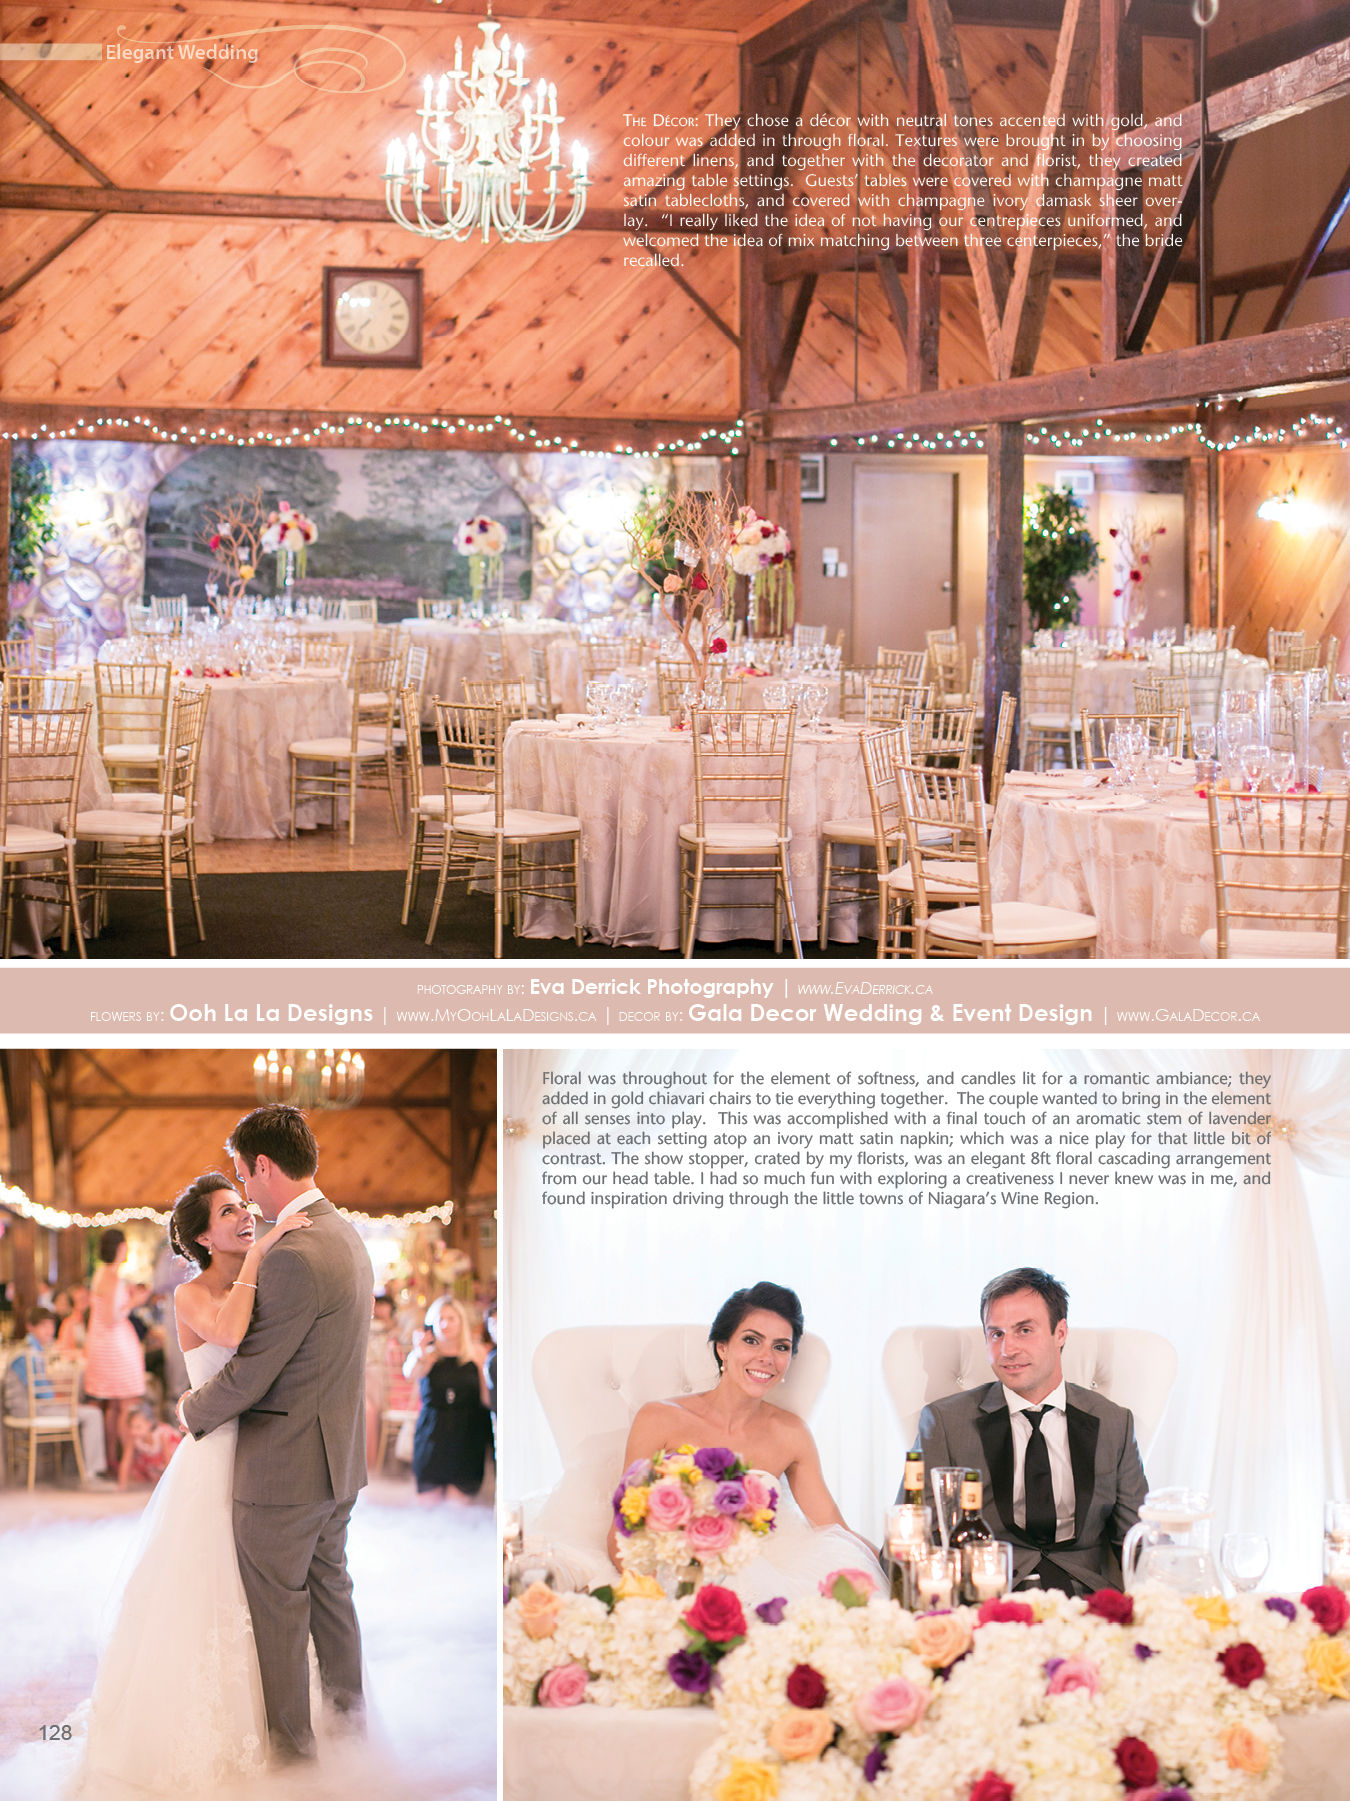 niagara-wedding-photographer-niagara-region-niagara-weddings-elegant-wedding-magazine-feature-nancy-kyle-chipchura-phoenix-coyotes-eva-derrick-photography-hernder-estate-wines-winery-vineyard-wedding-barn-wedding-2.jpg